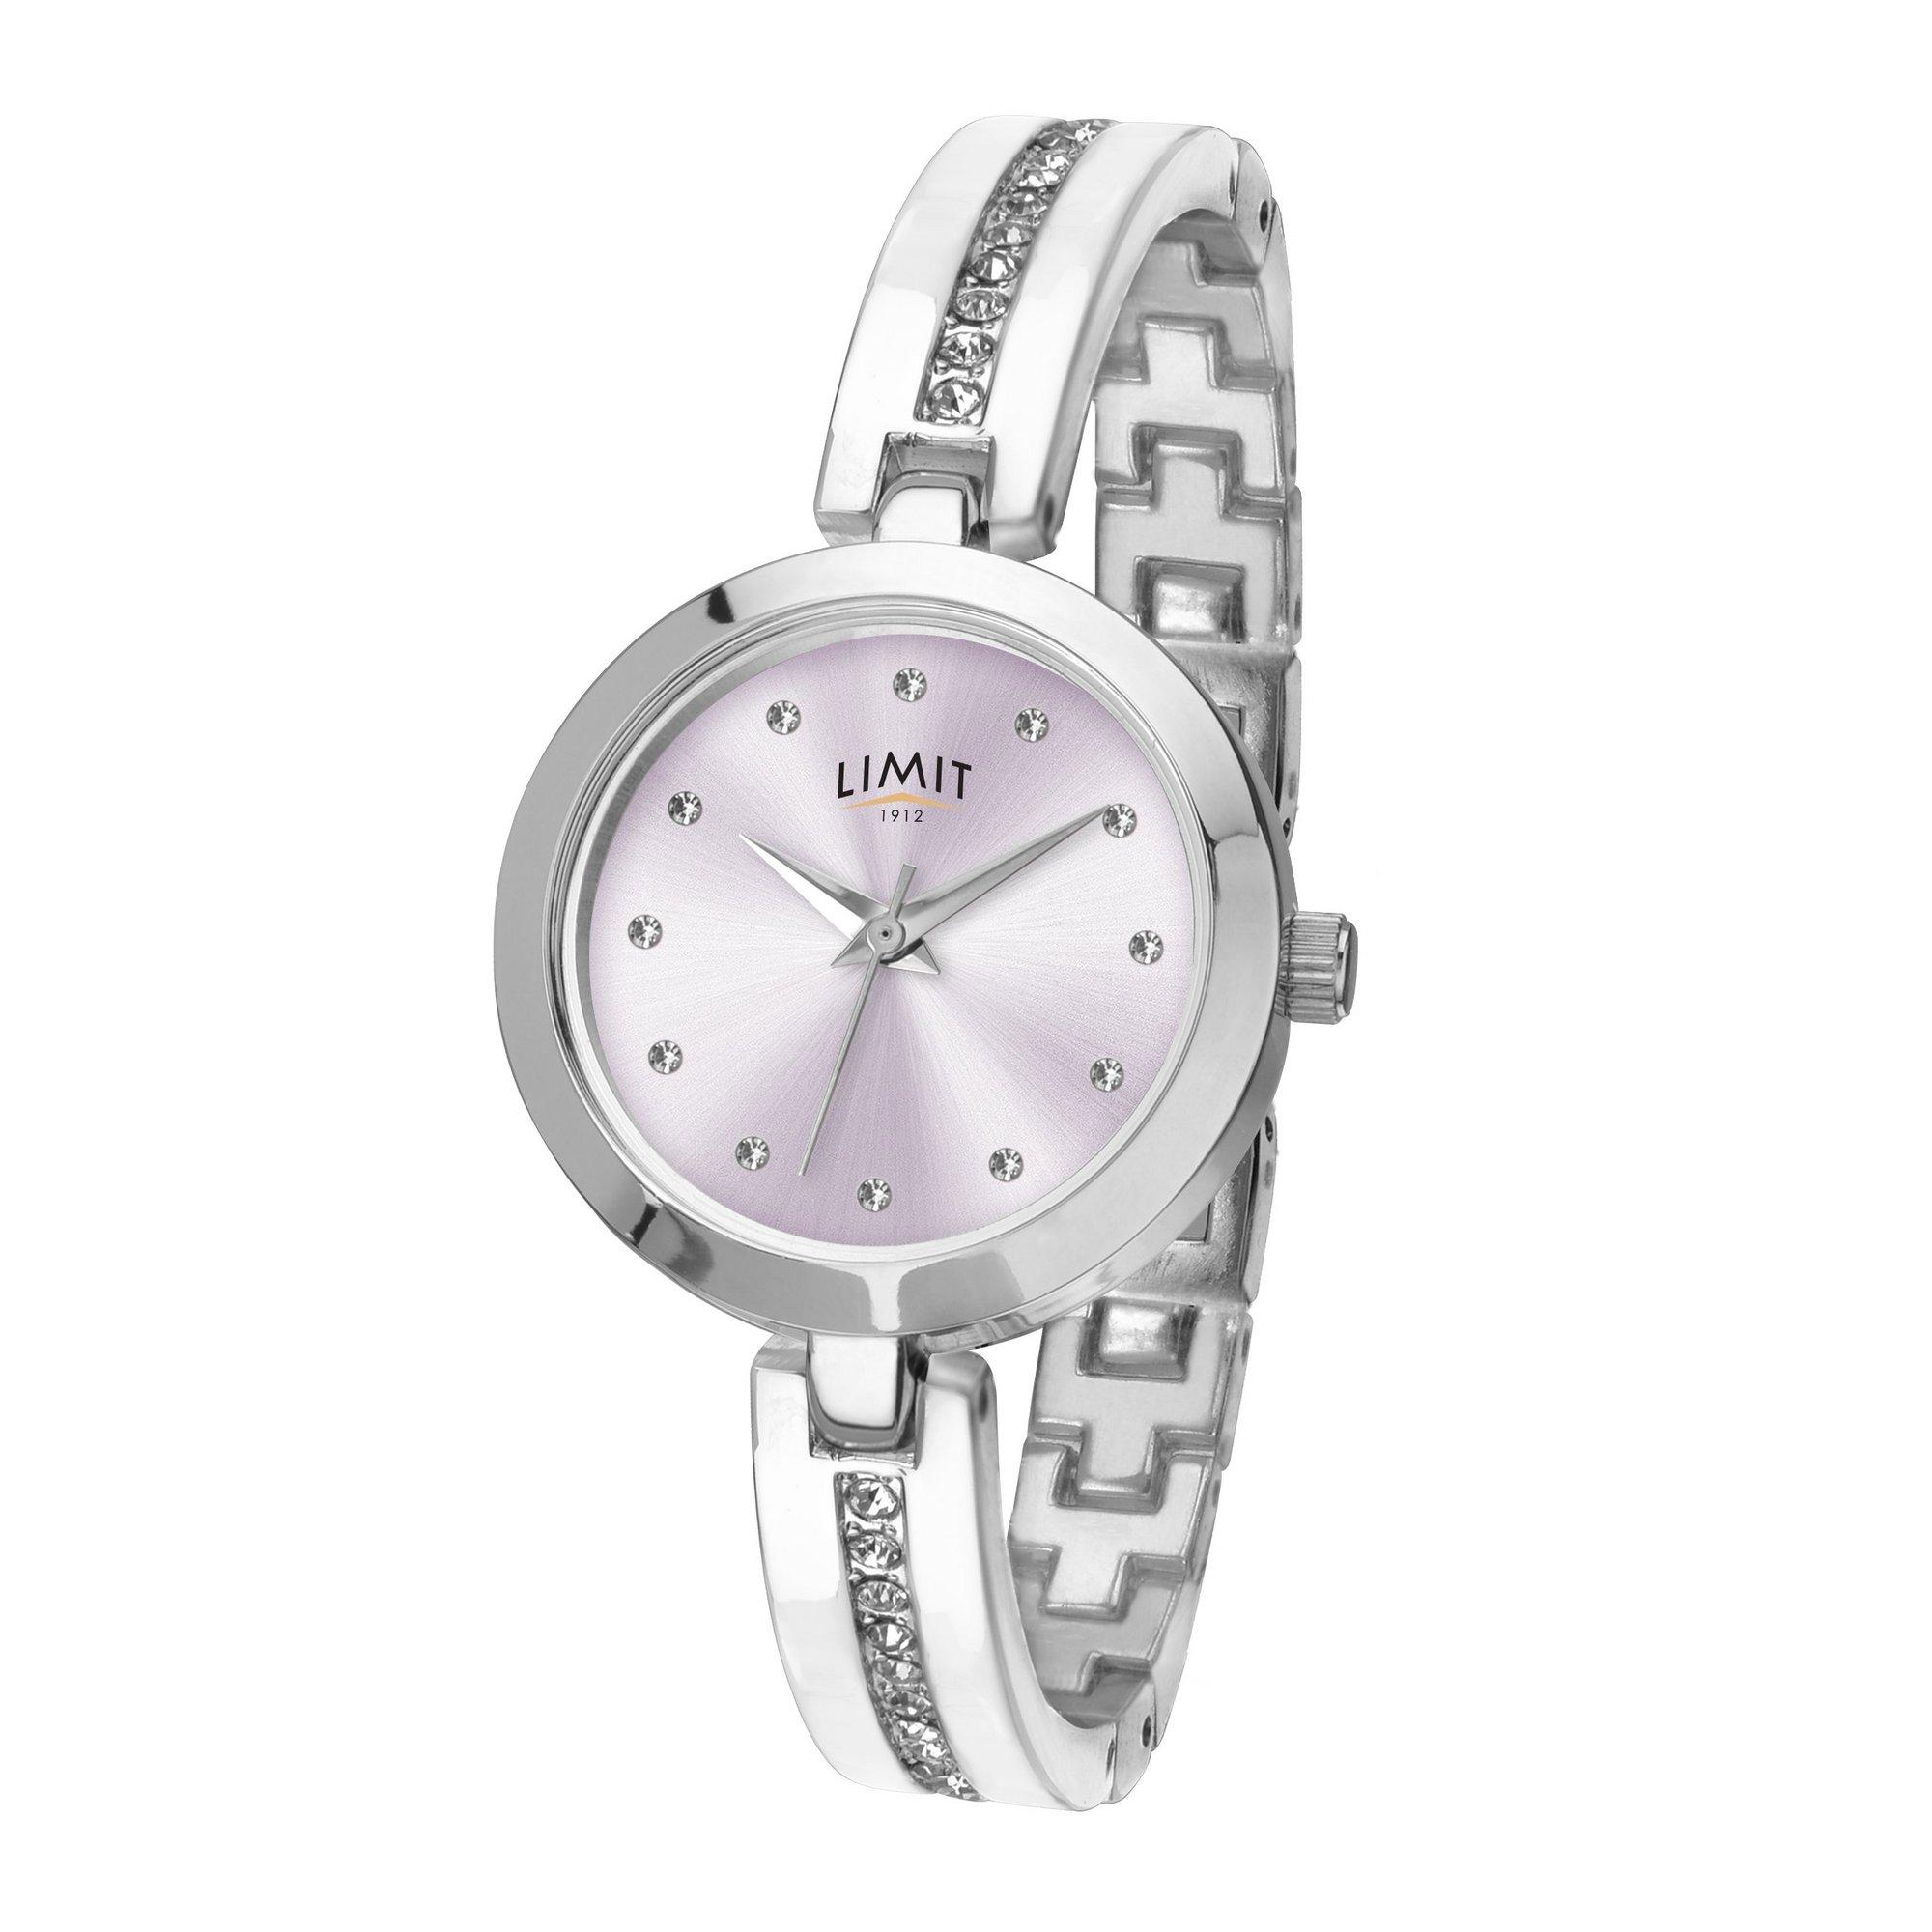 Image of Limit Ladies Silver Bracelet Watch